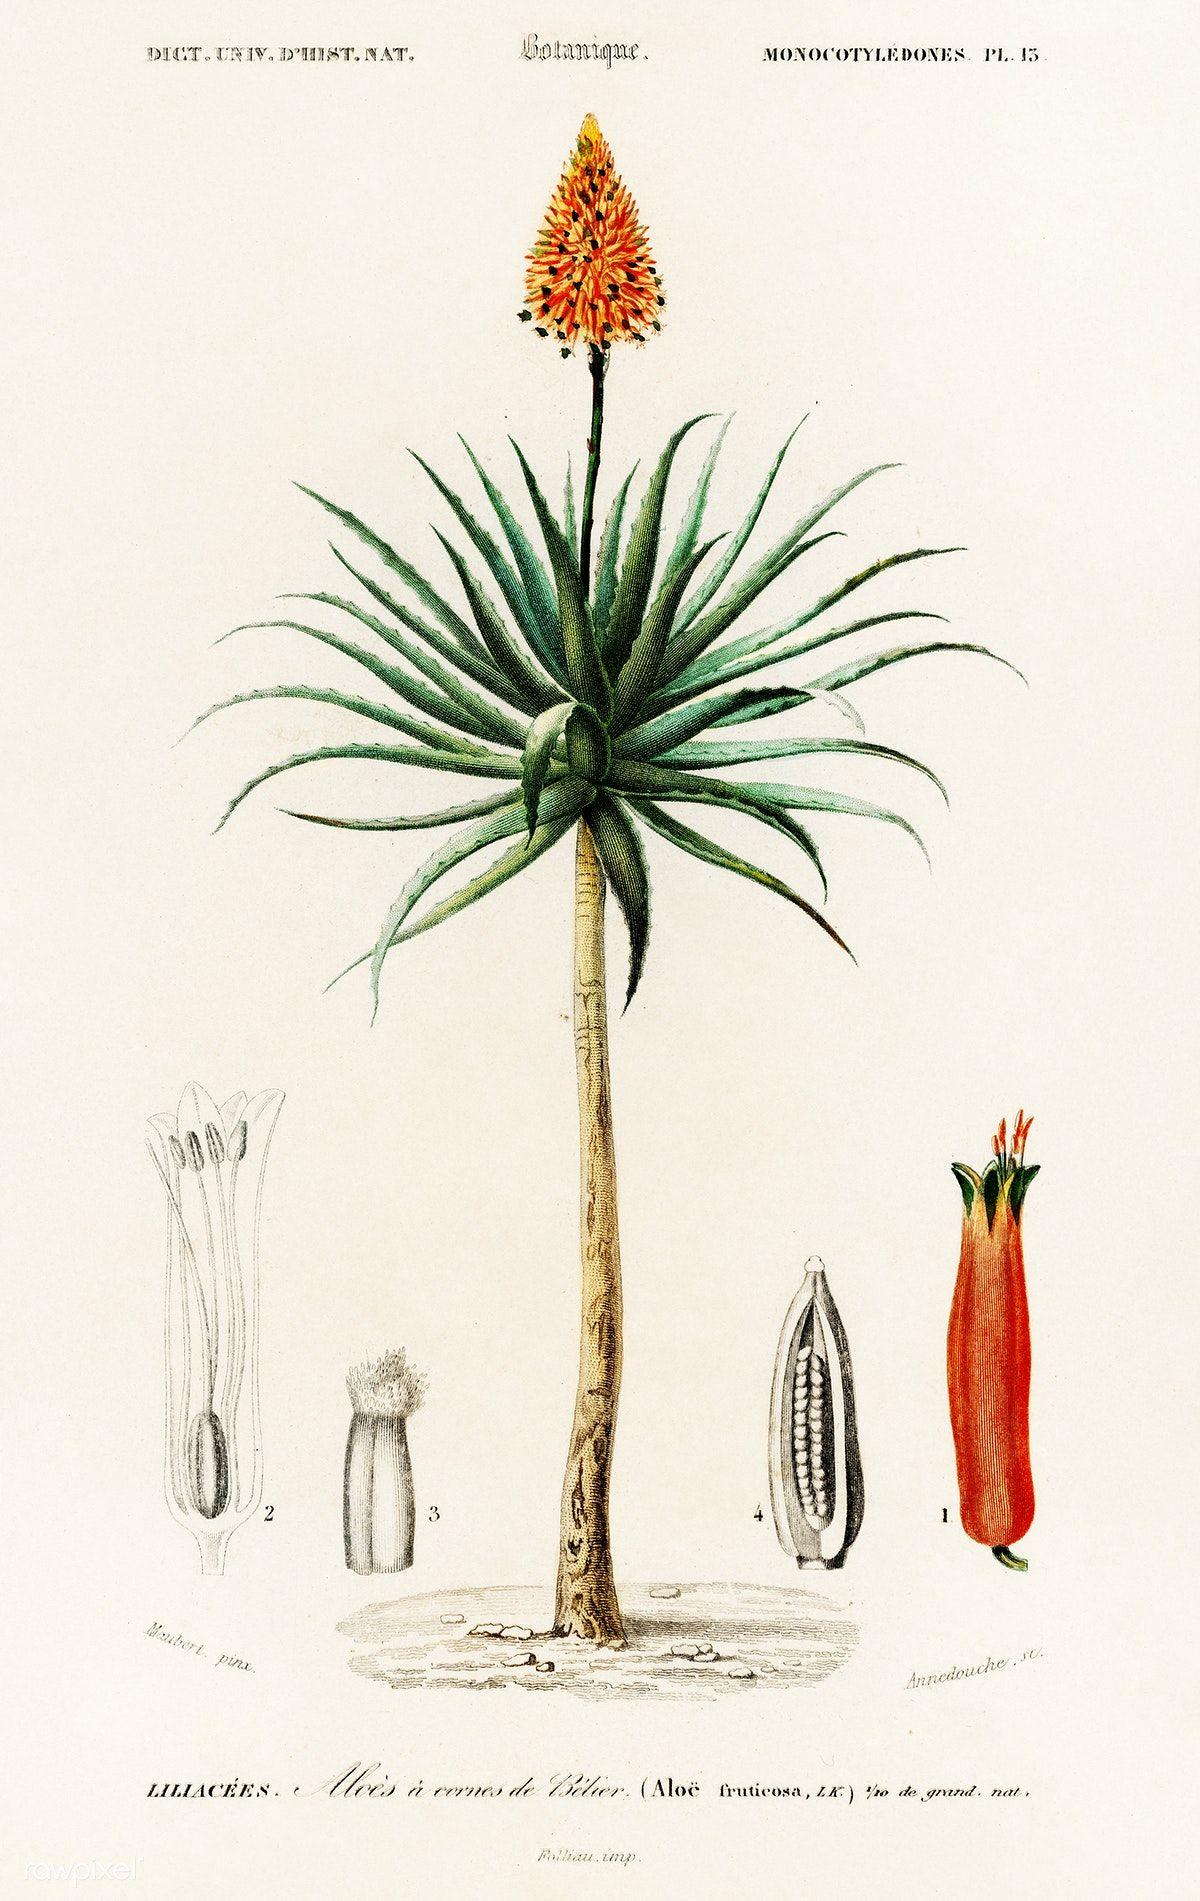 Candelabra Aloe Aloe Fruticosa Illustrated By Charles Dessalines D Orbigny 1806 1876 Digitally Enhanced From Our O Botanical Art Antique Prints Botanical